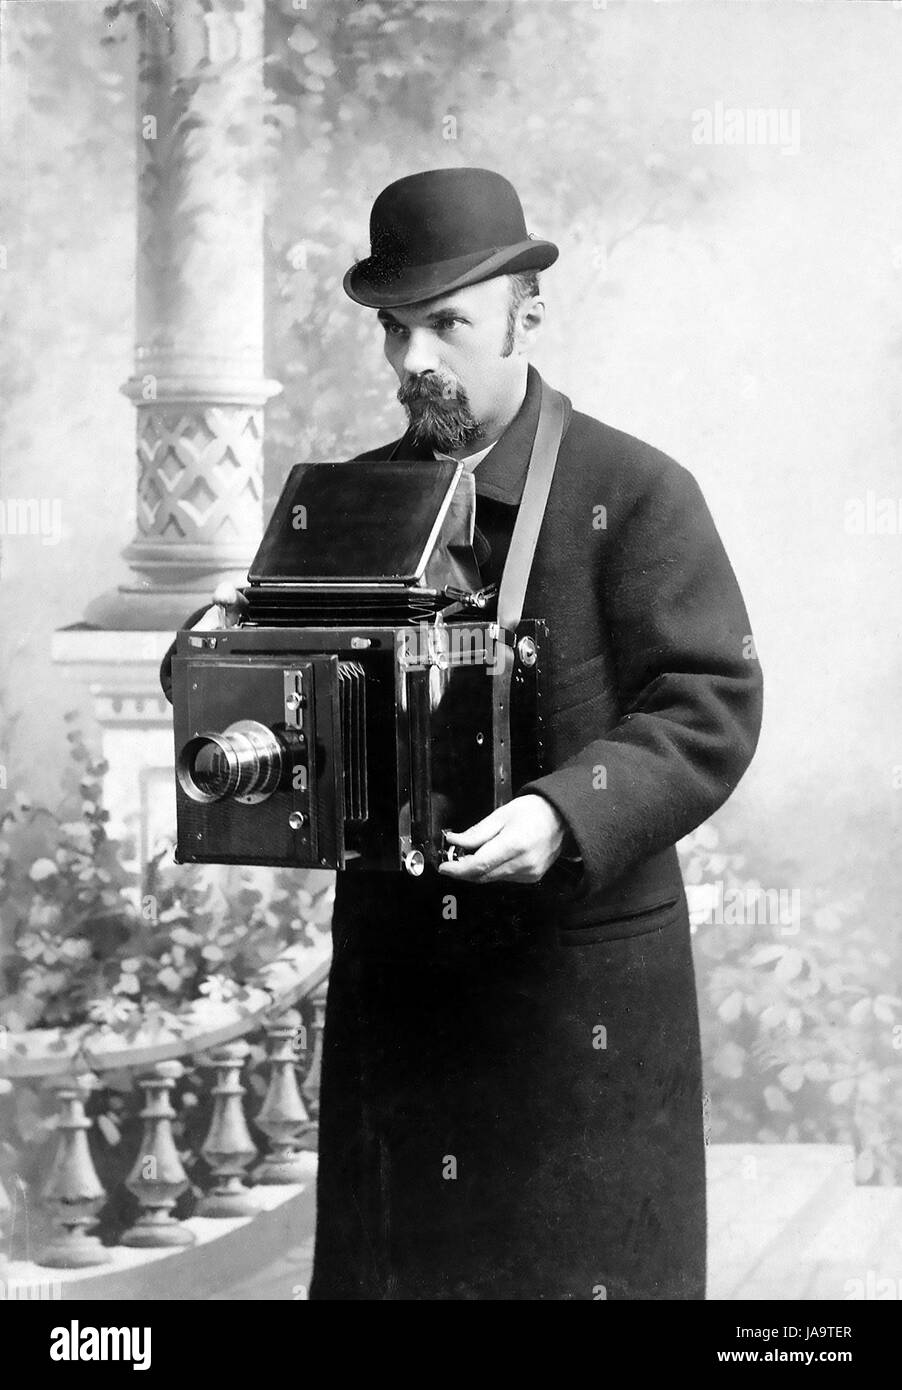 KARL BULLA (c 1855- 1929) German-Russian photographer in a 1917 self-portrait - Stock Image